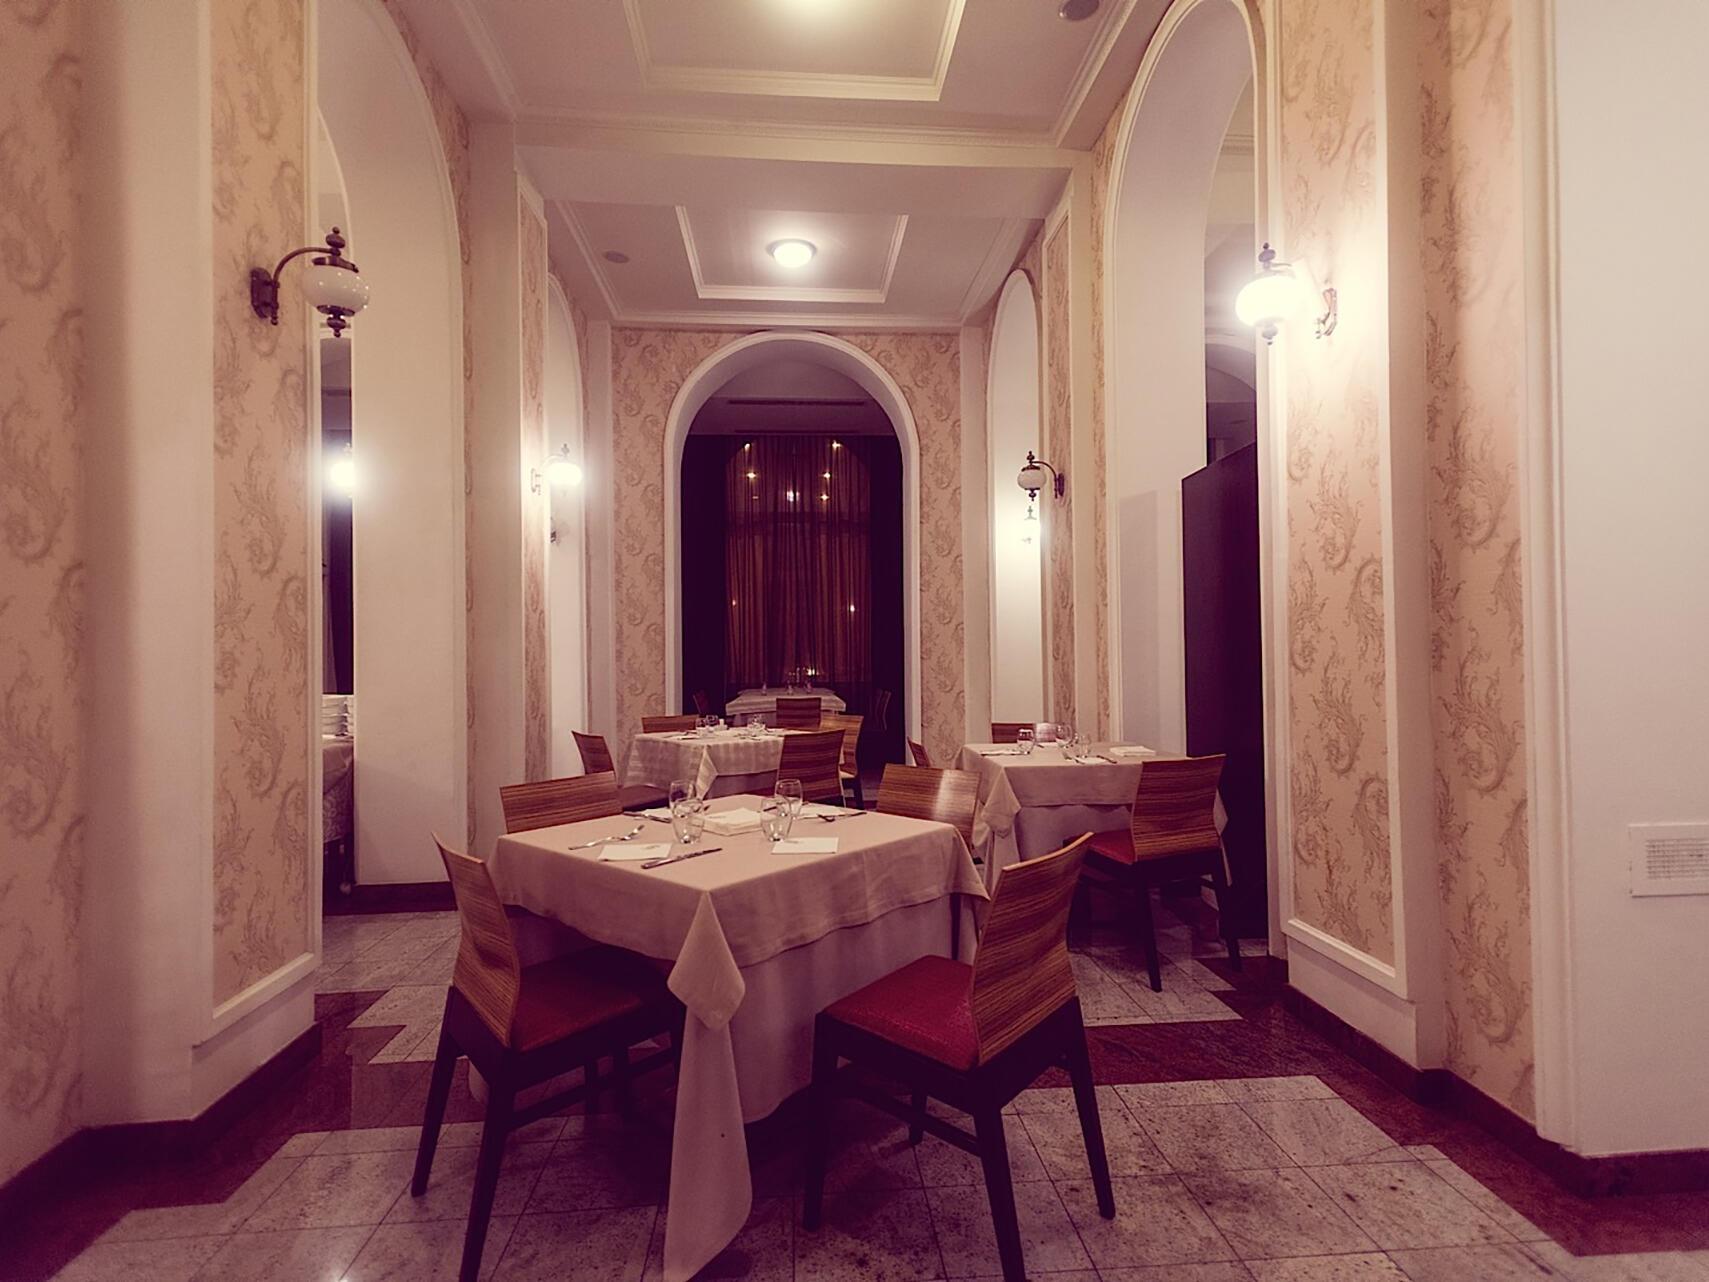 Coriolis Restaurant at IAKI Conference & Spa Hotel in Mamaia